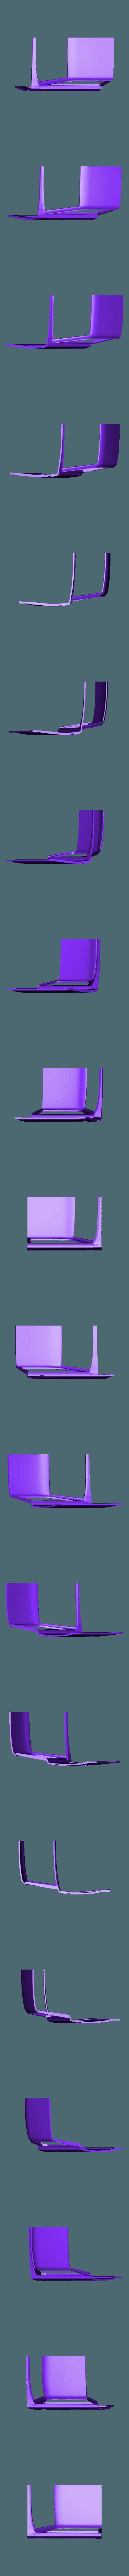 Lada_Niva (5).stl Download STL file Lada Niva  • 3D printing template, serega1337